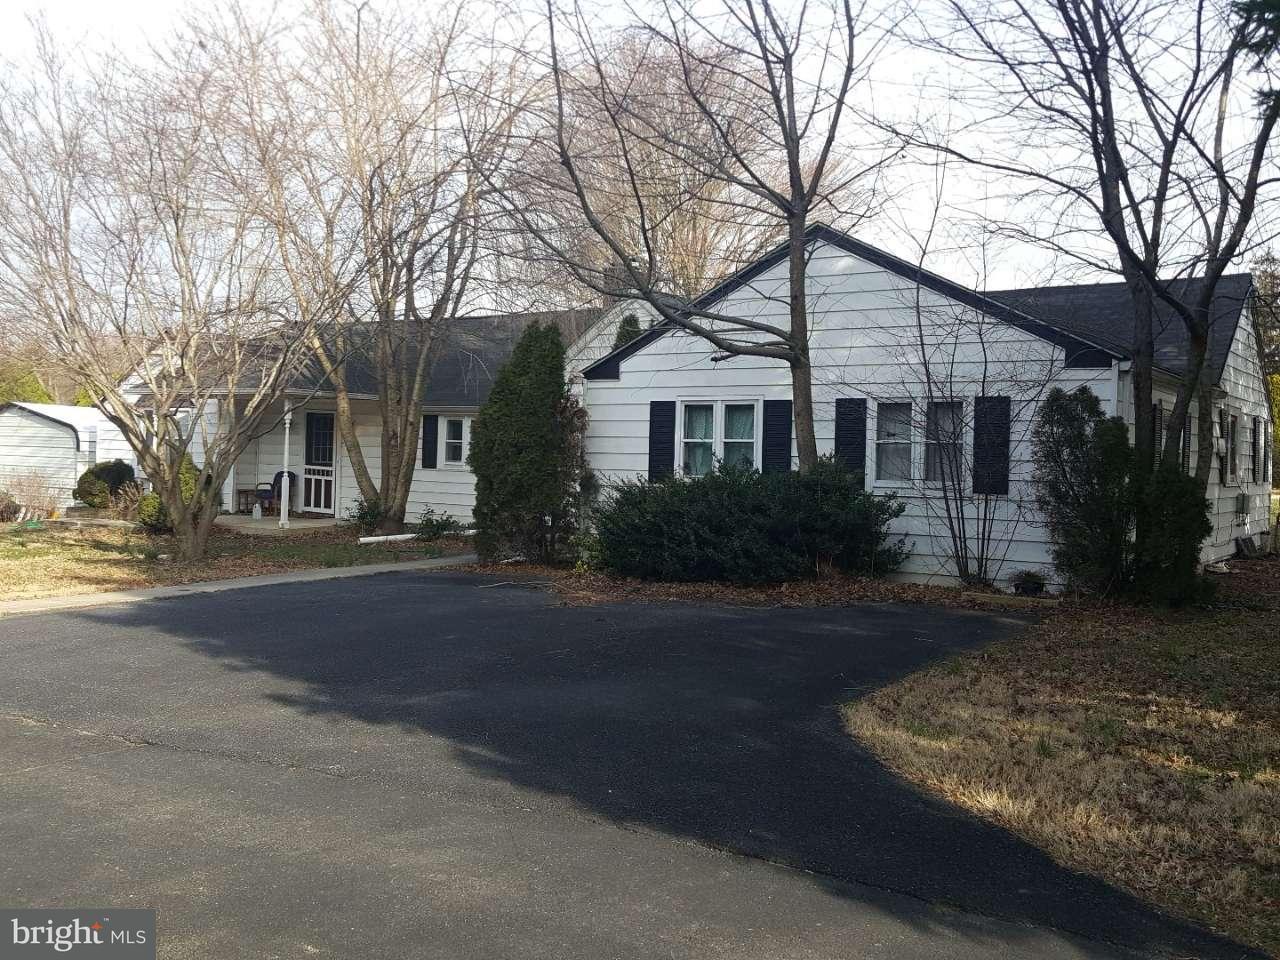 Single Family Home for Sale at 8 GLEN BERNE Drive Newport, Delaware 19804 United States